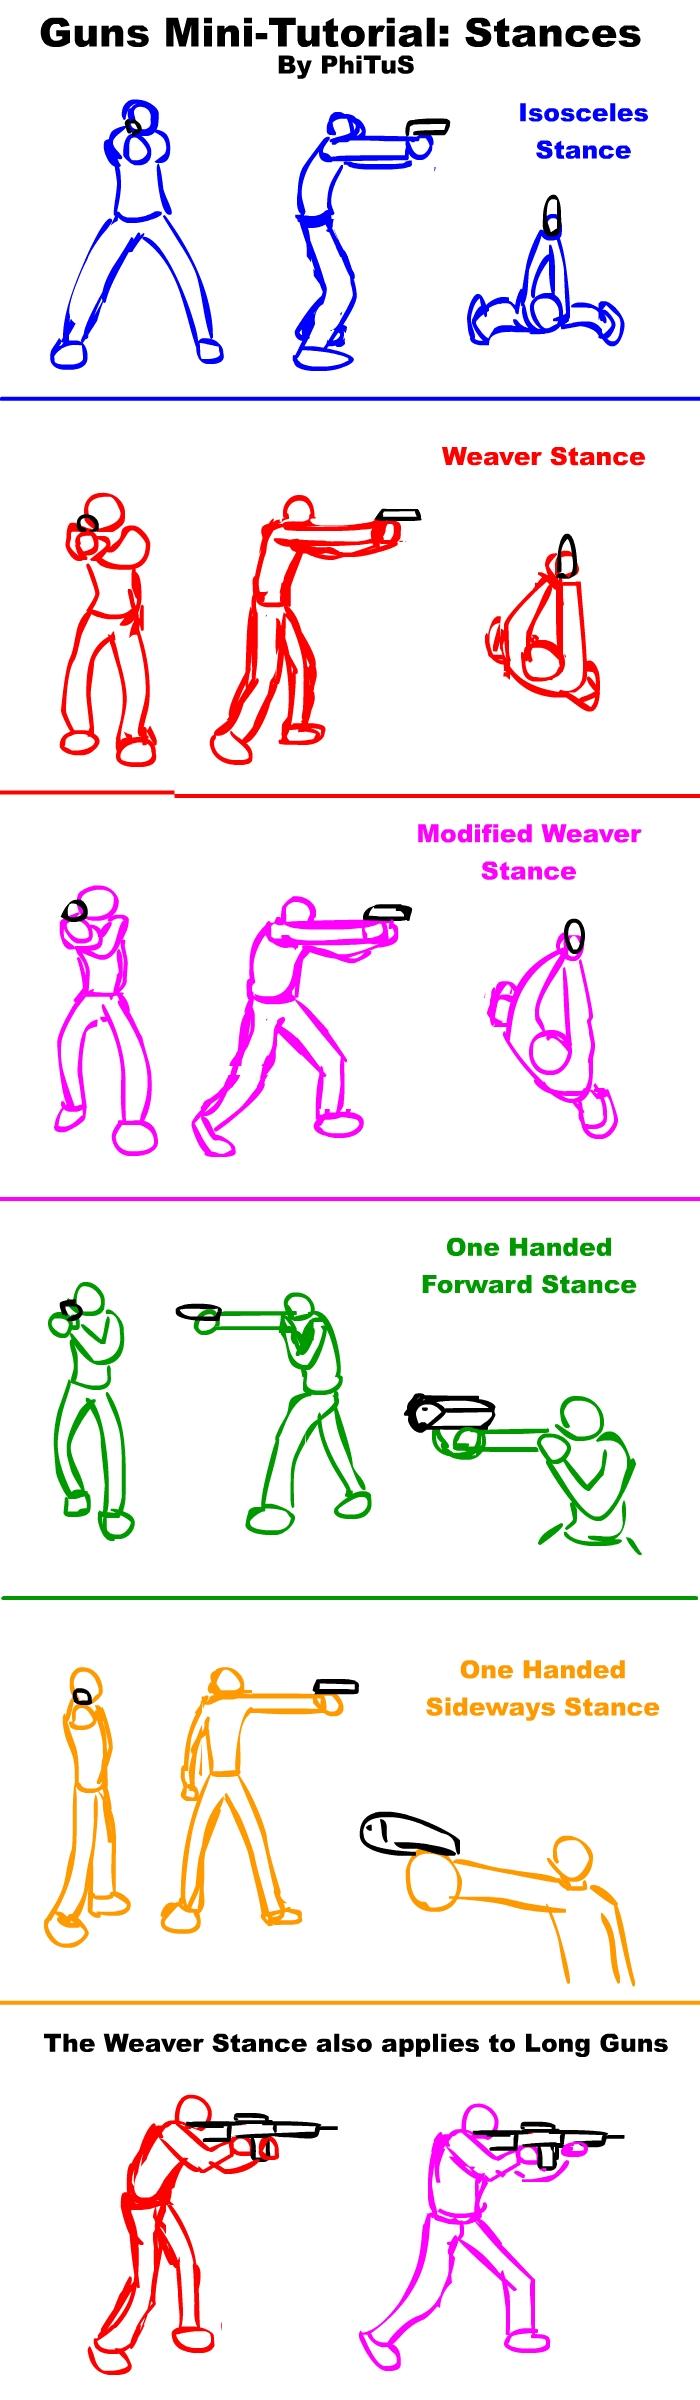 Guns Mini-Tutorial: Stances by PhiTuS